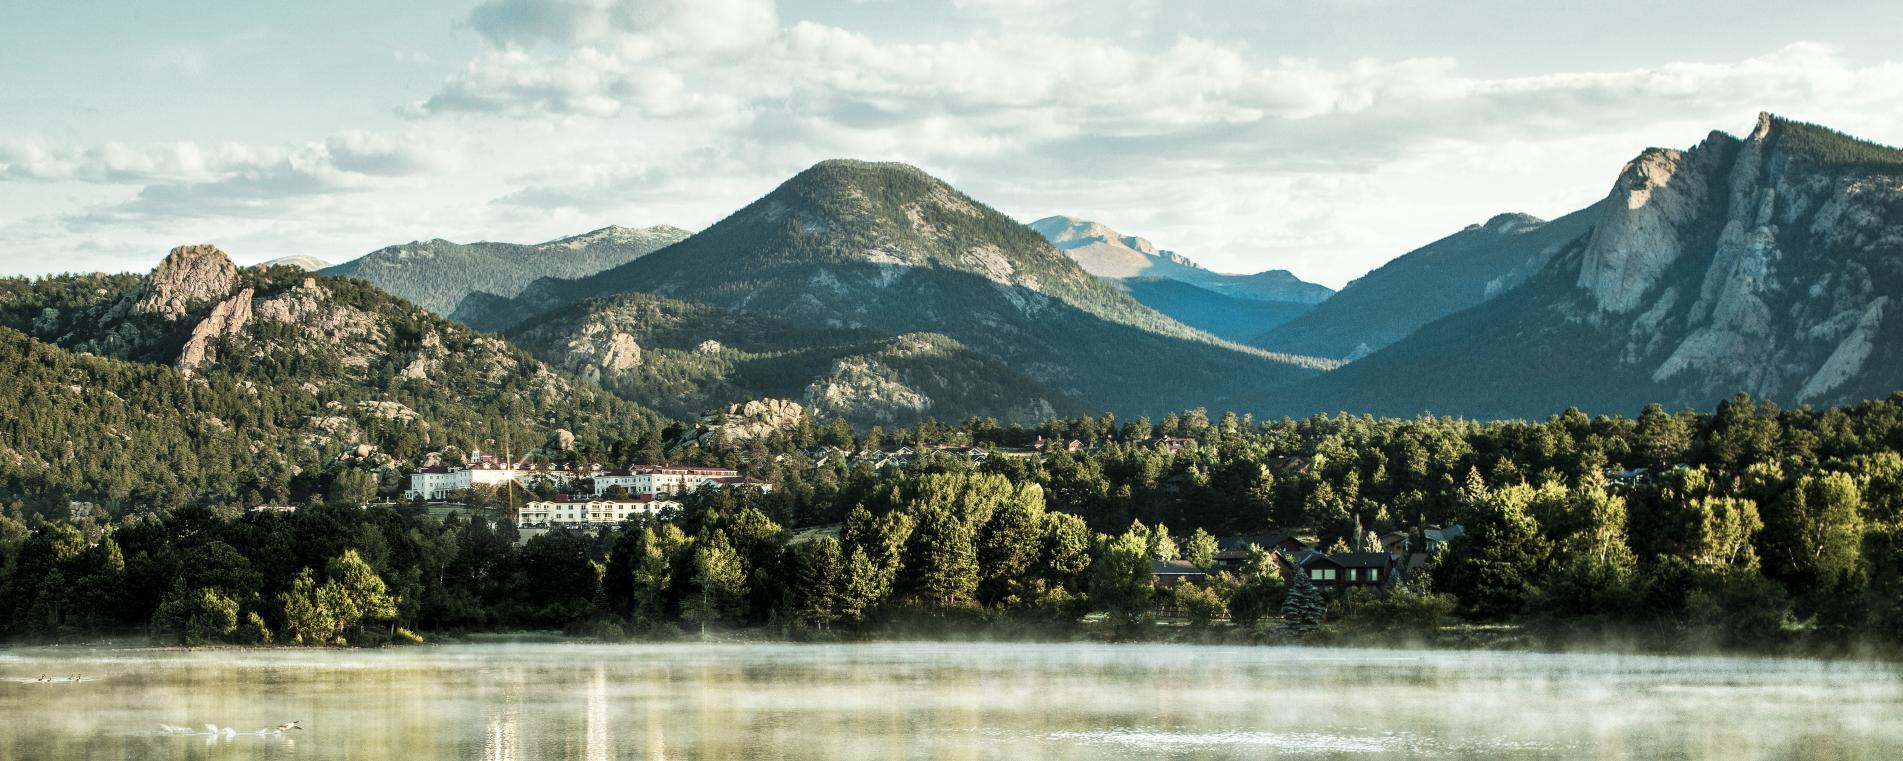 20070331_Colorado_Estes Park_Summer_AllenKennedy_Kayak_002